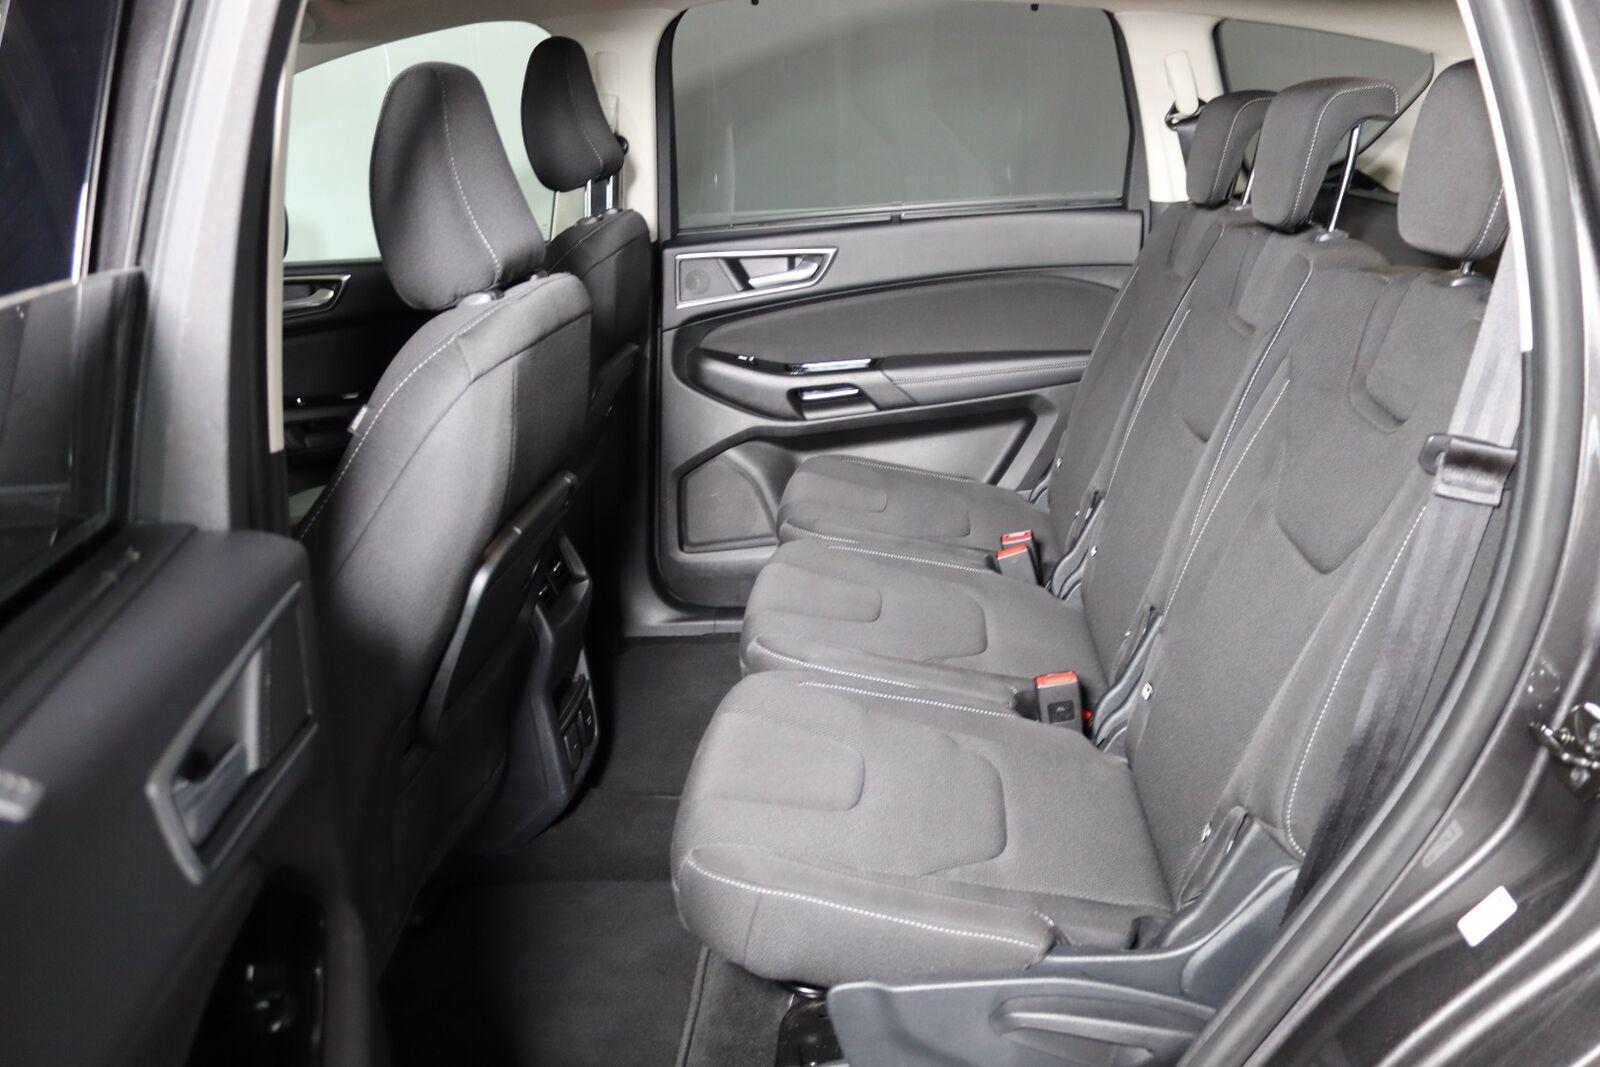 Ford S-MAX 2,0 TDCi 150 Titanium aut. 7prs - billede 6